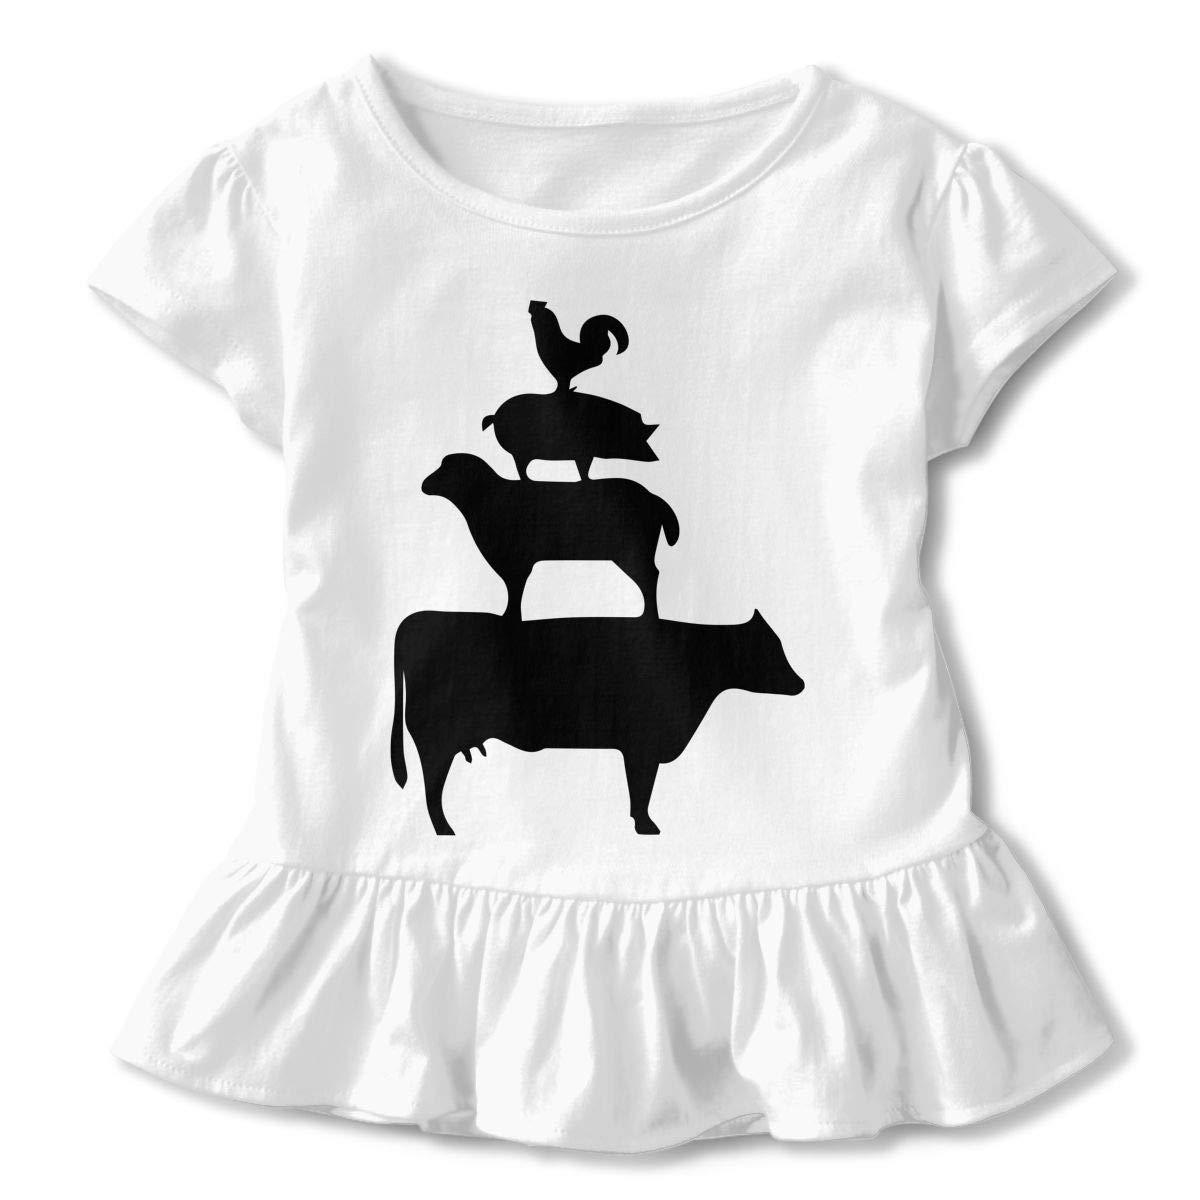 Stacked Farm Animals Childrens Girls Short Sleeve T-Shirts Ruffles Shirt T-Shirt for 2-6T